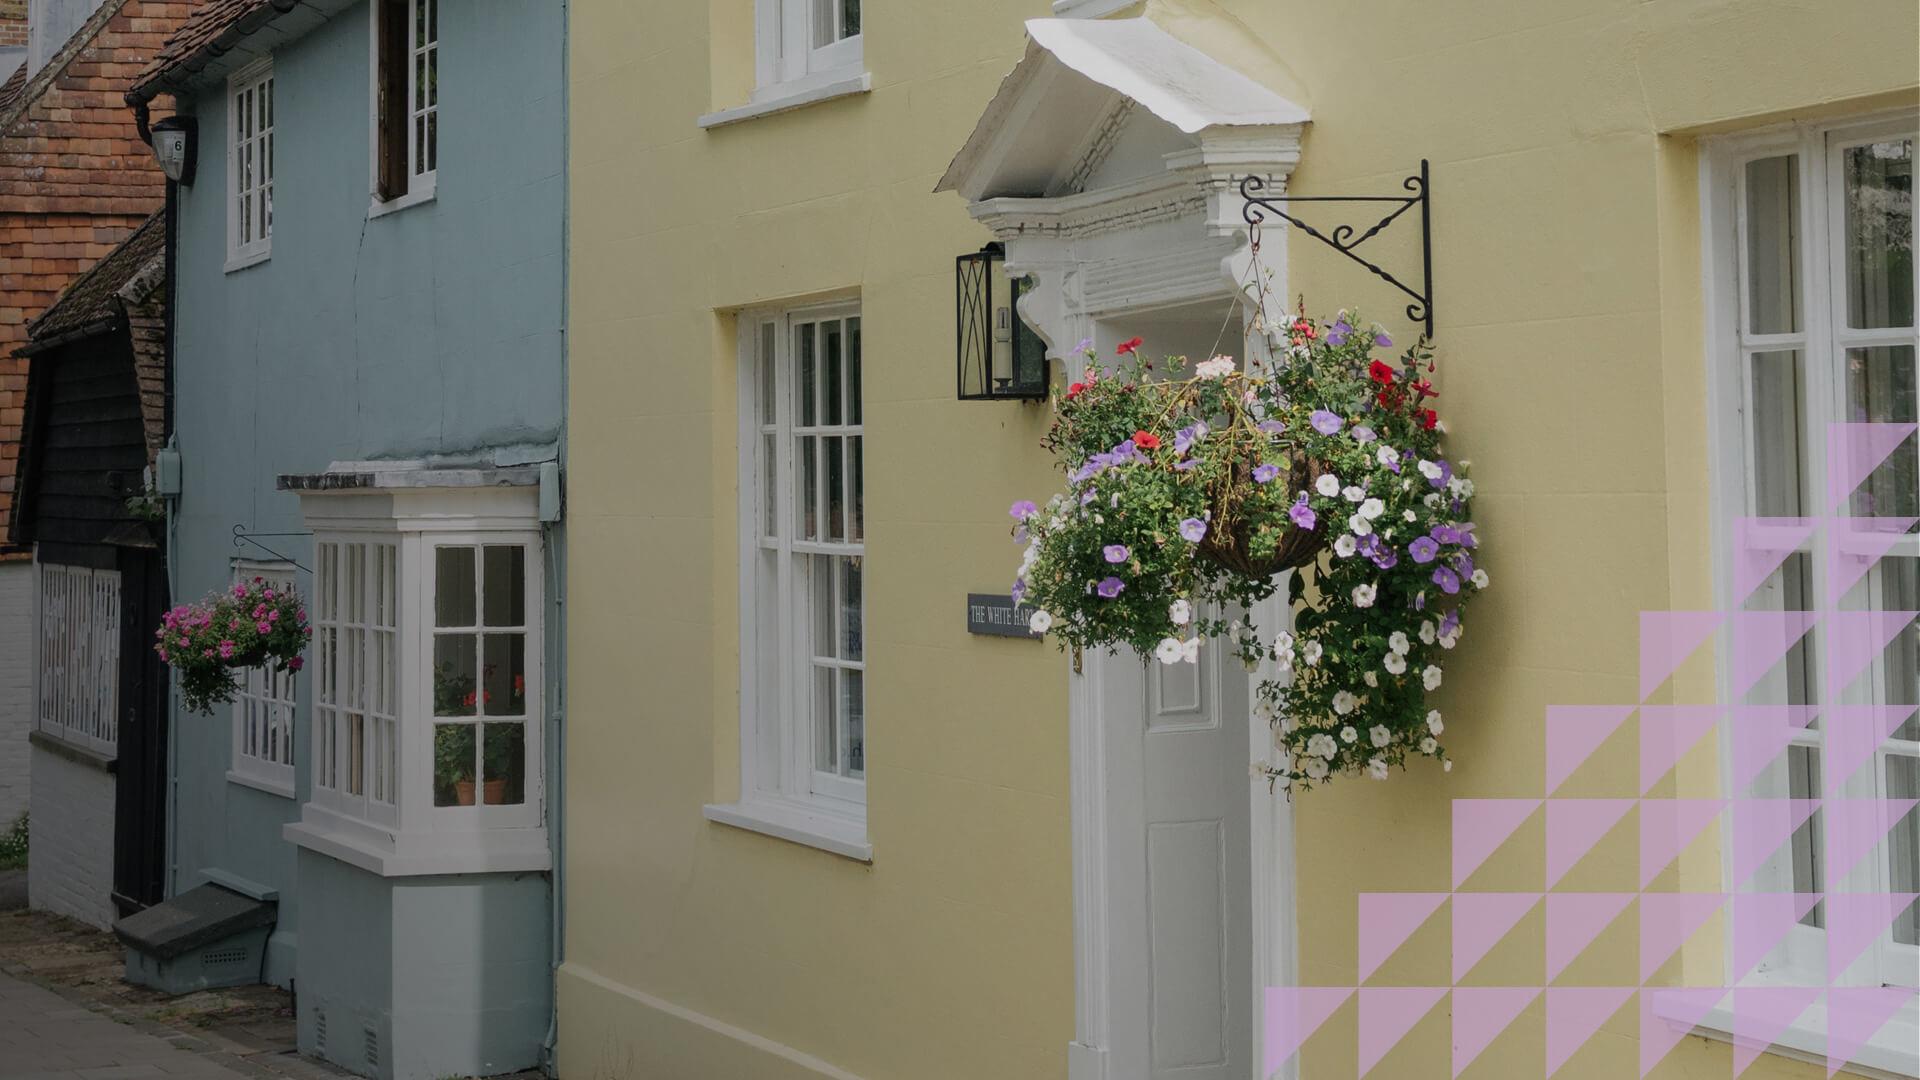 Hampshire Street